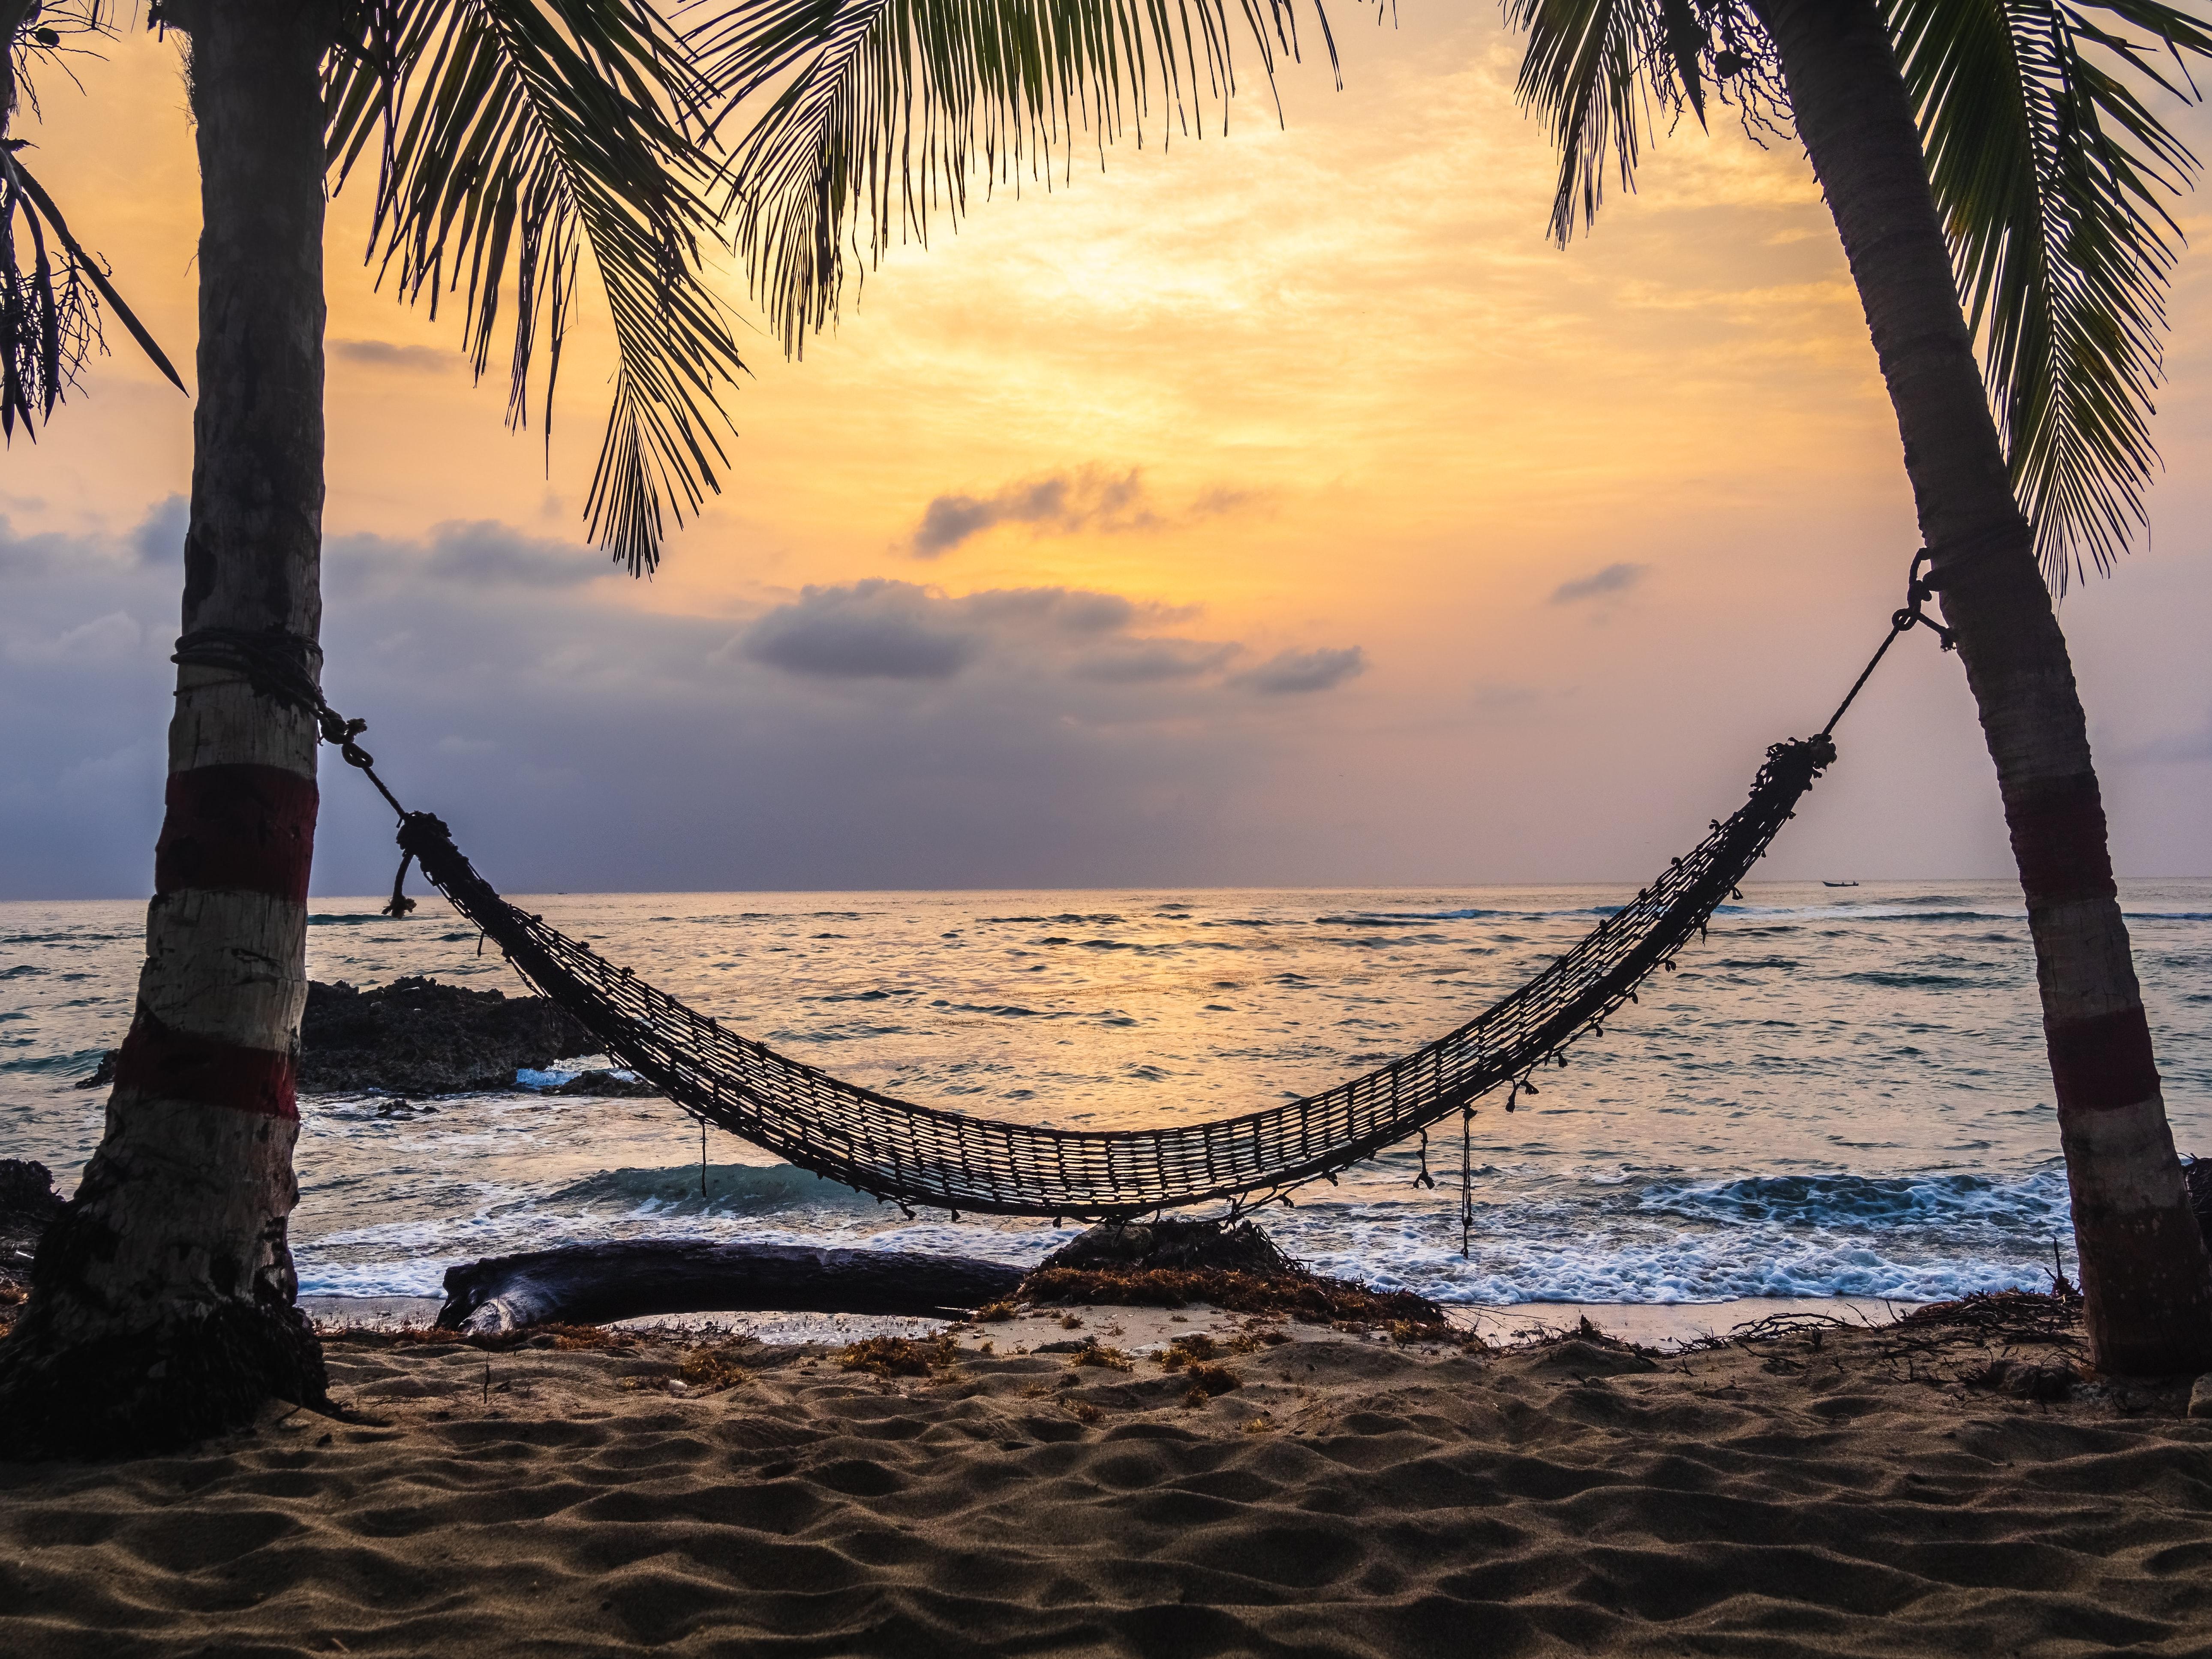 diy hammock on the beach